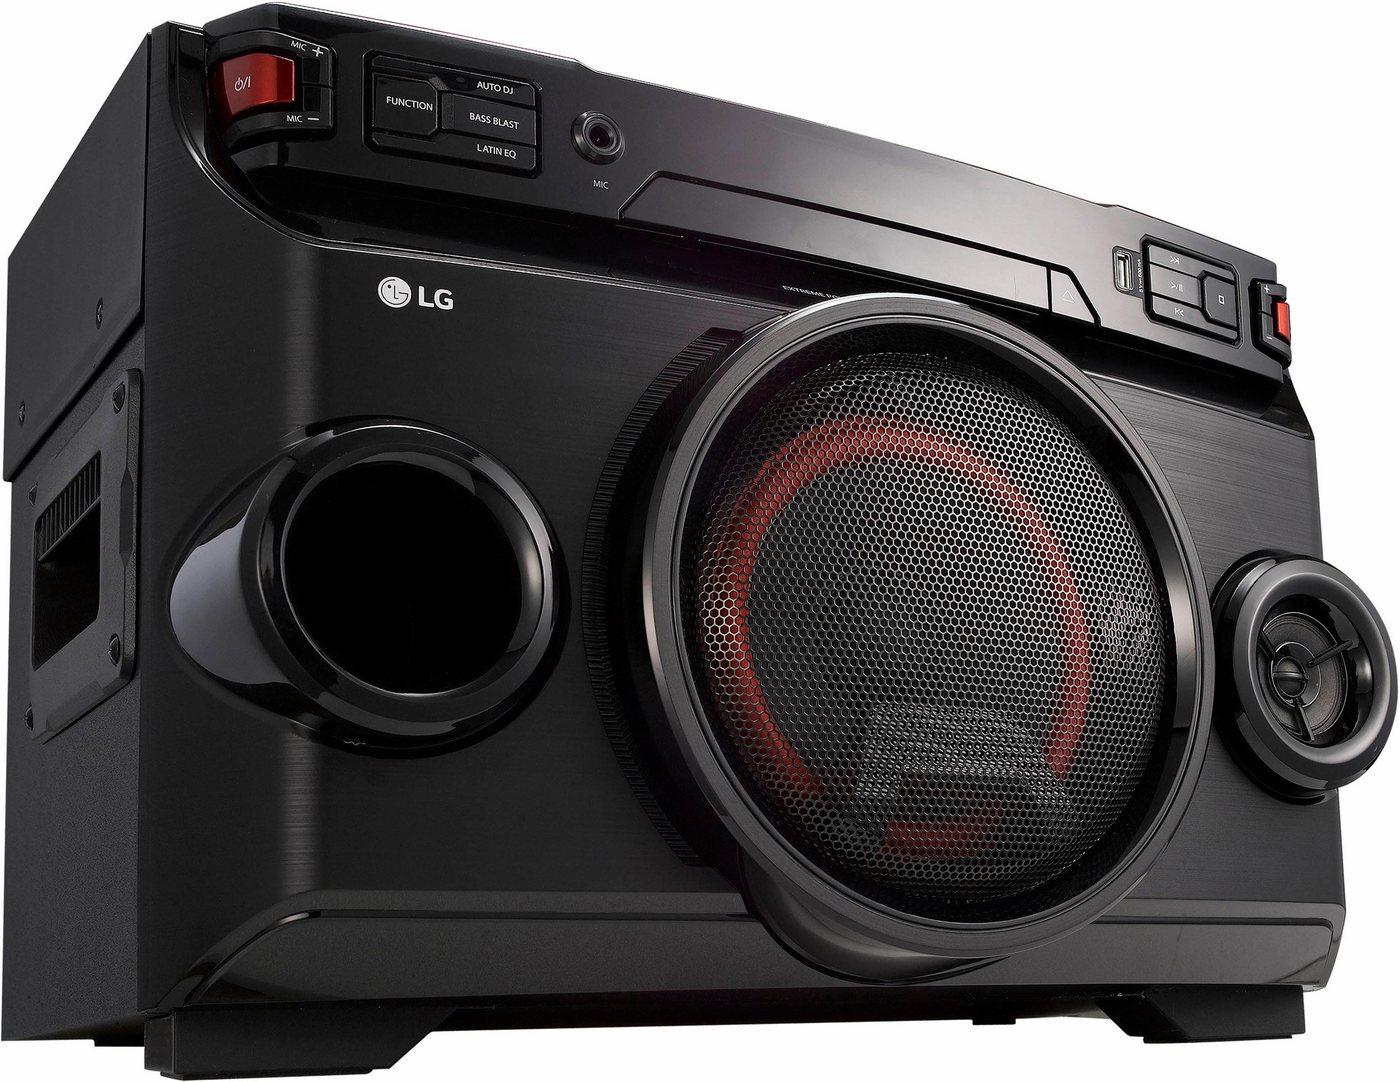 LG OM4560 Stereoanlage, Bluetooth, RDS, 1x USB - Preisvergleich